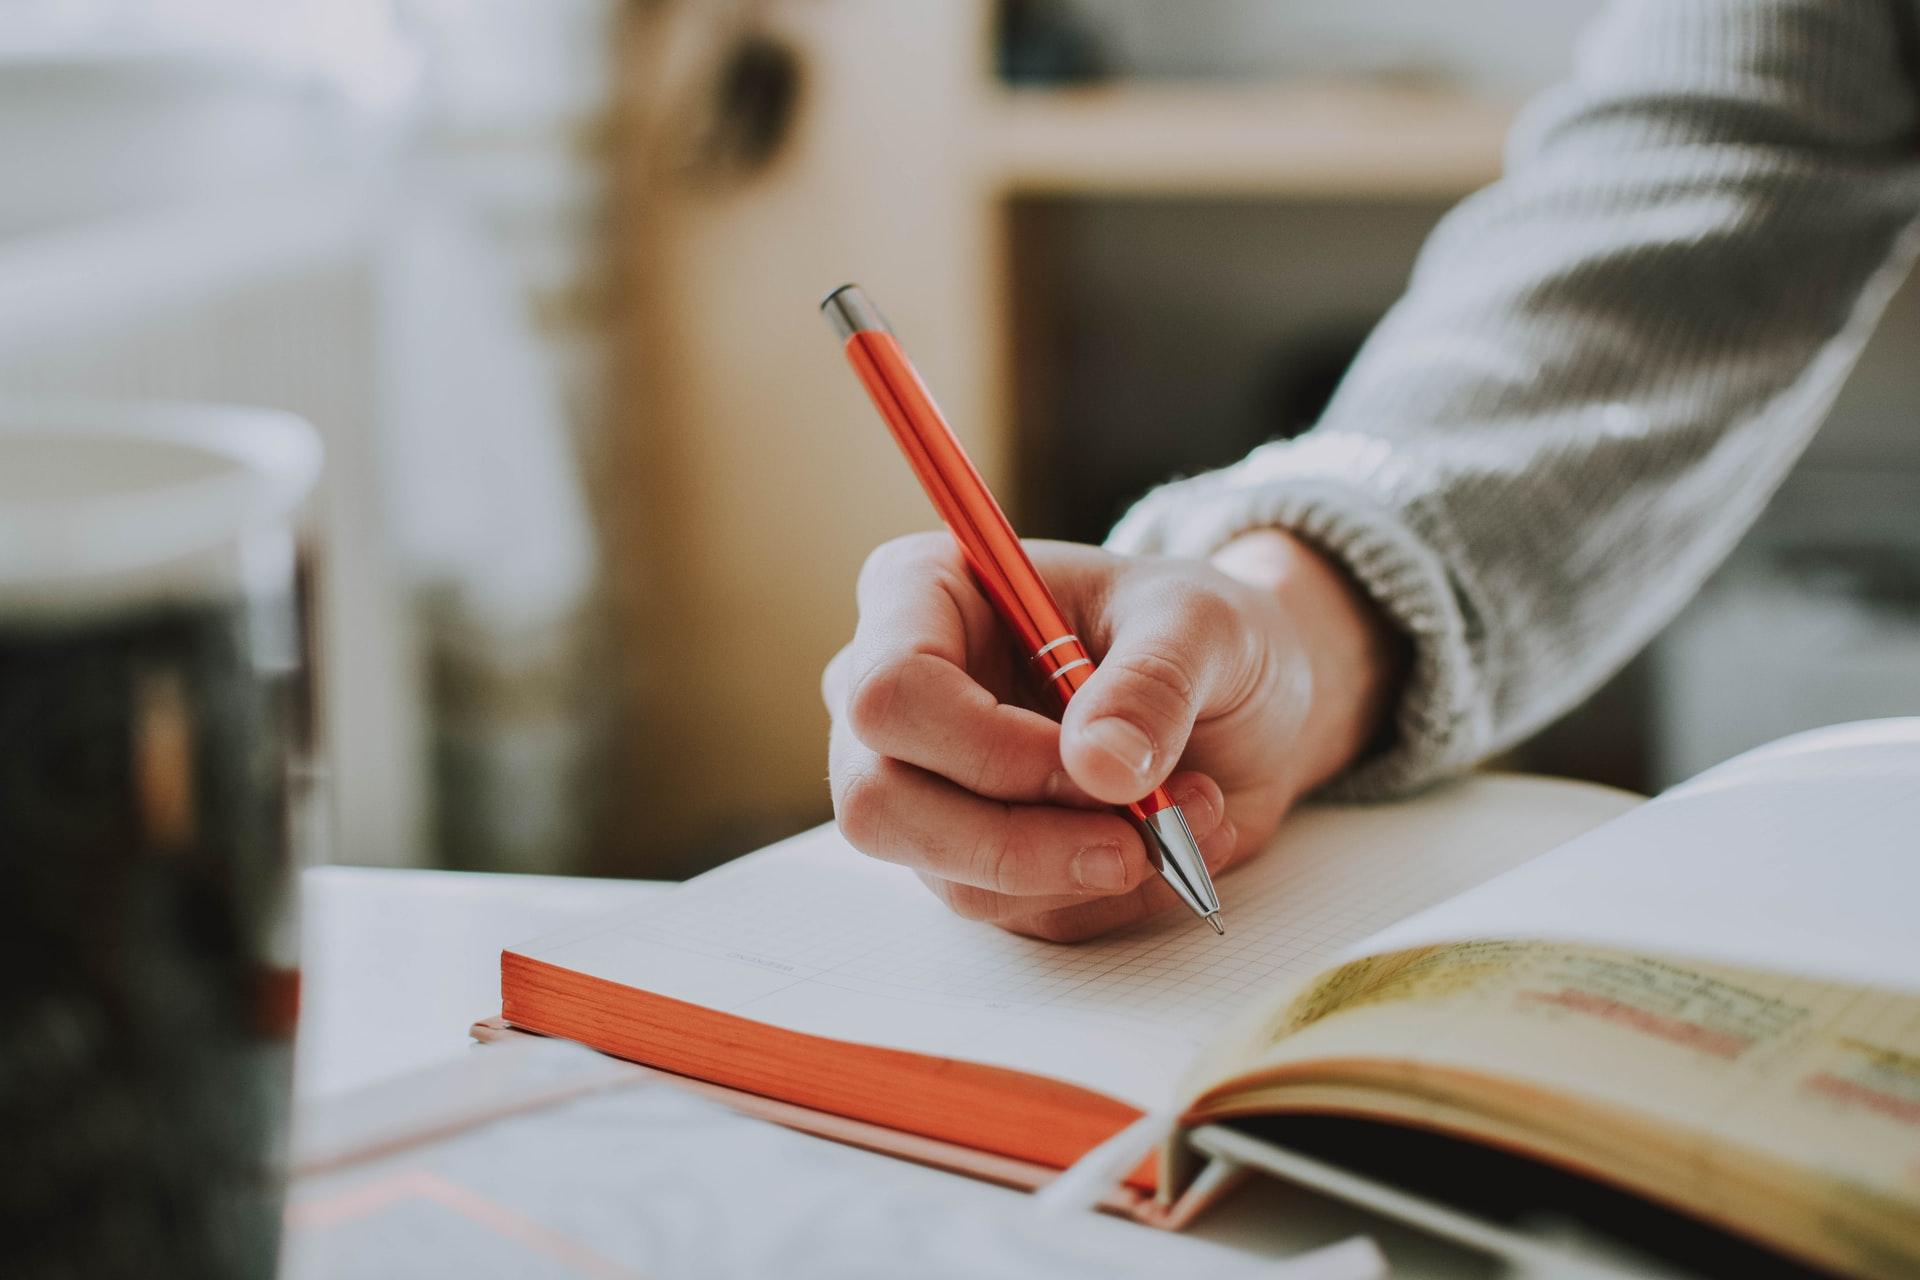 Meditative journaling